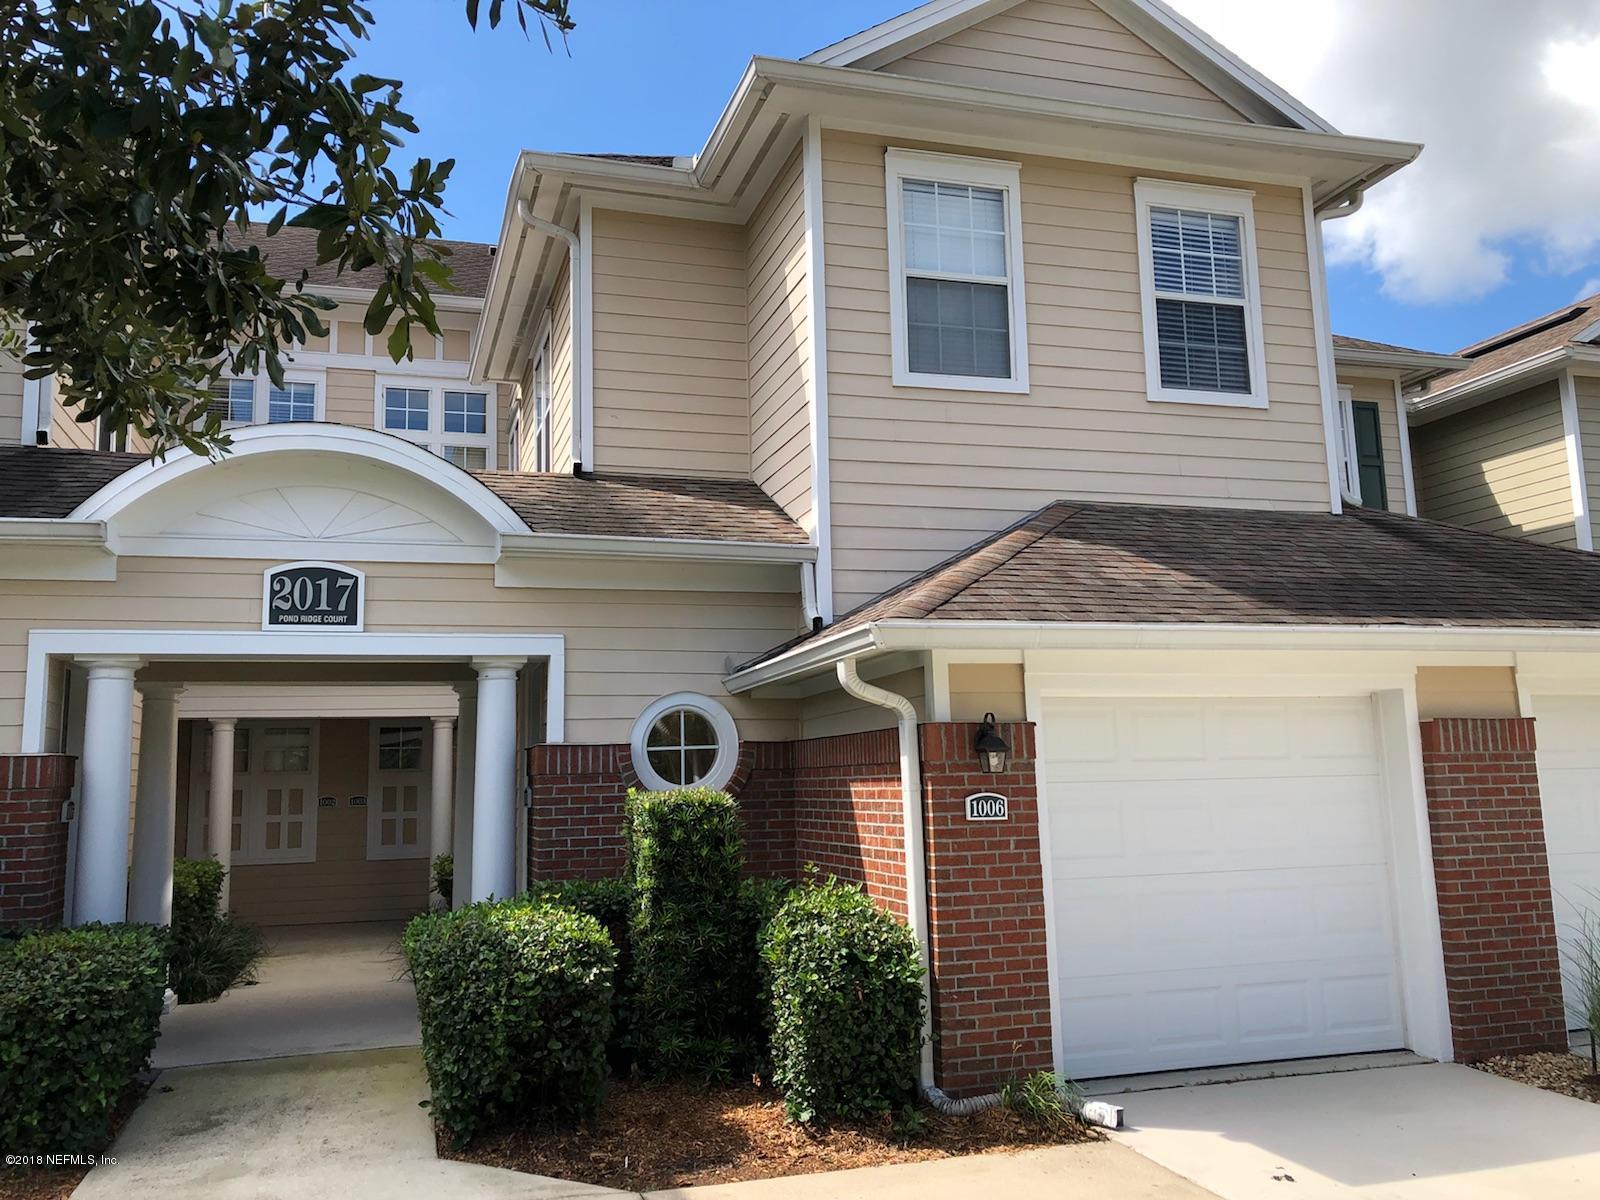 2017 POND RIDGE, FLEMING ISLAND, FLORIDA 32003, 3 Bedrooms Bedrooms, ,3 BathroomsBathrooms,Residential - condos/townhomes,For sale,POND RIDGE,955577